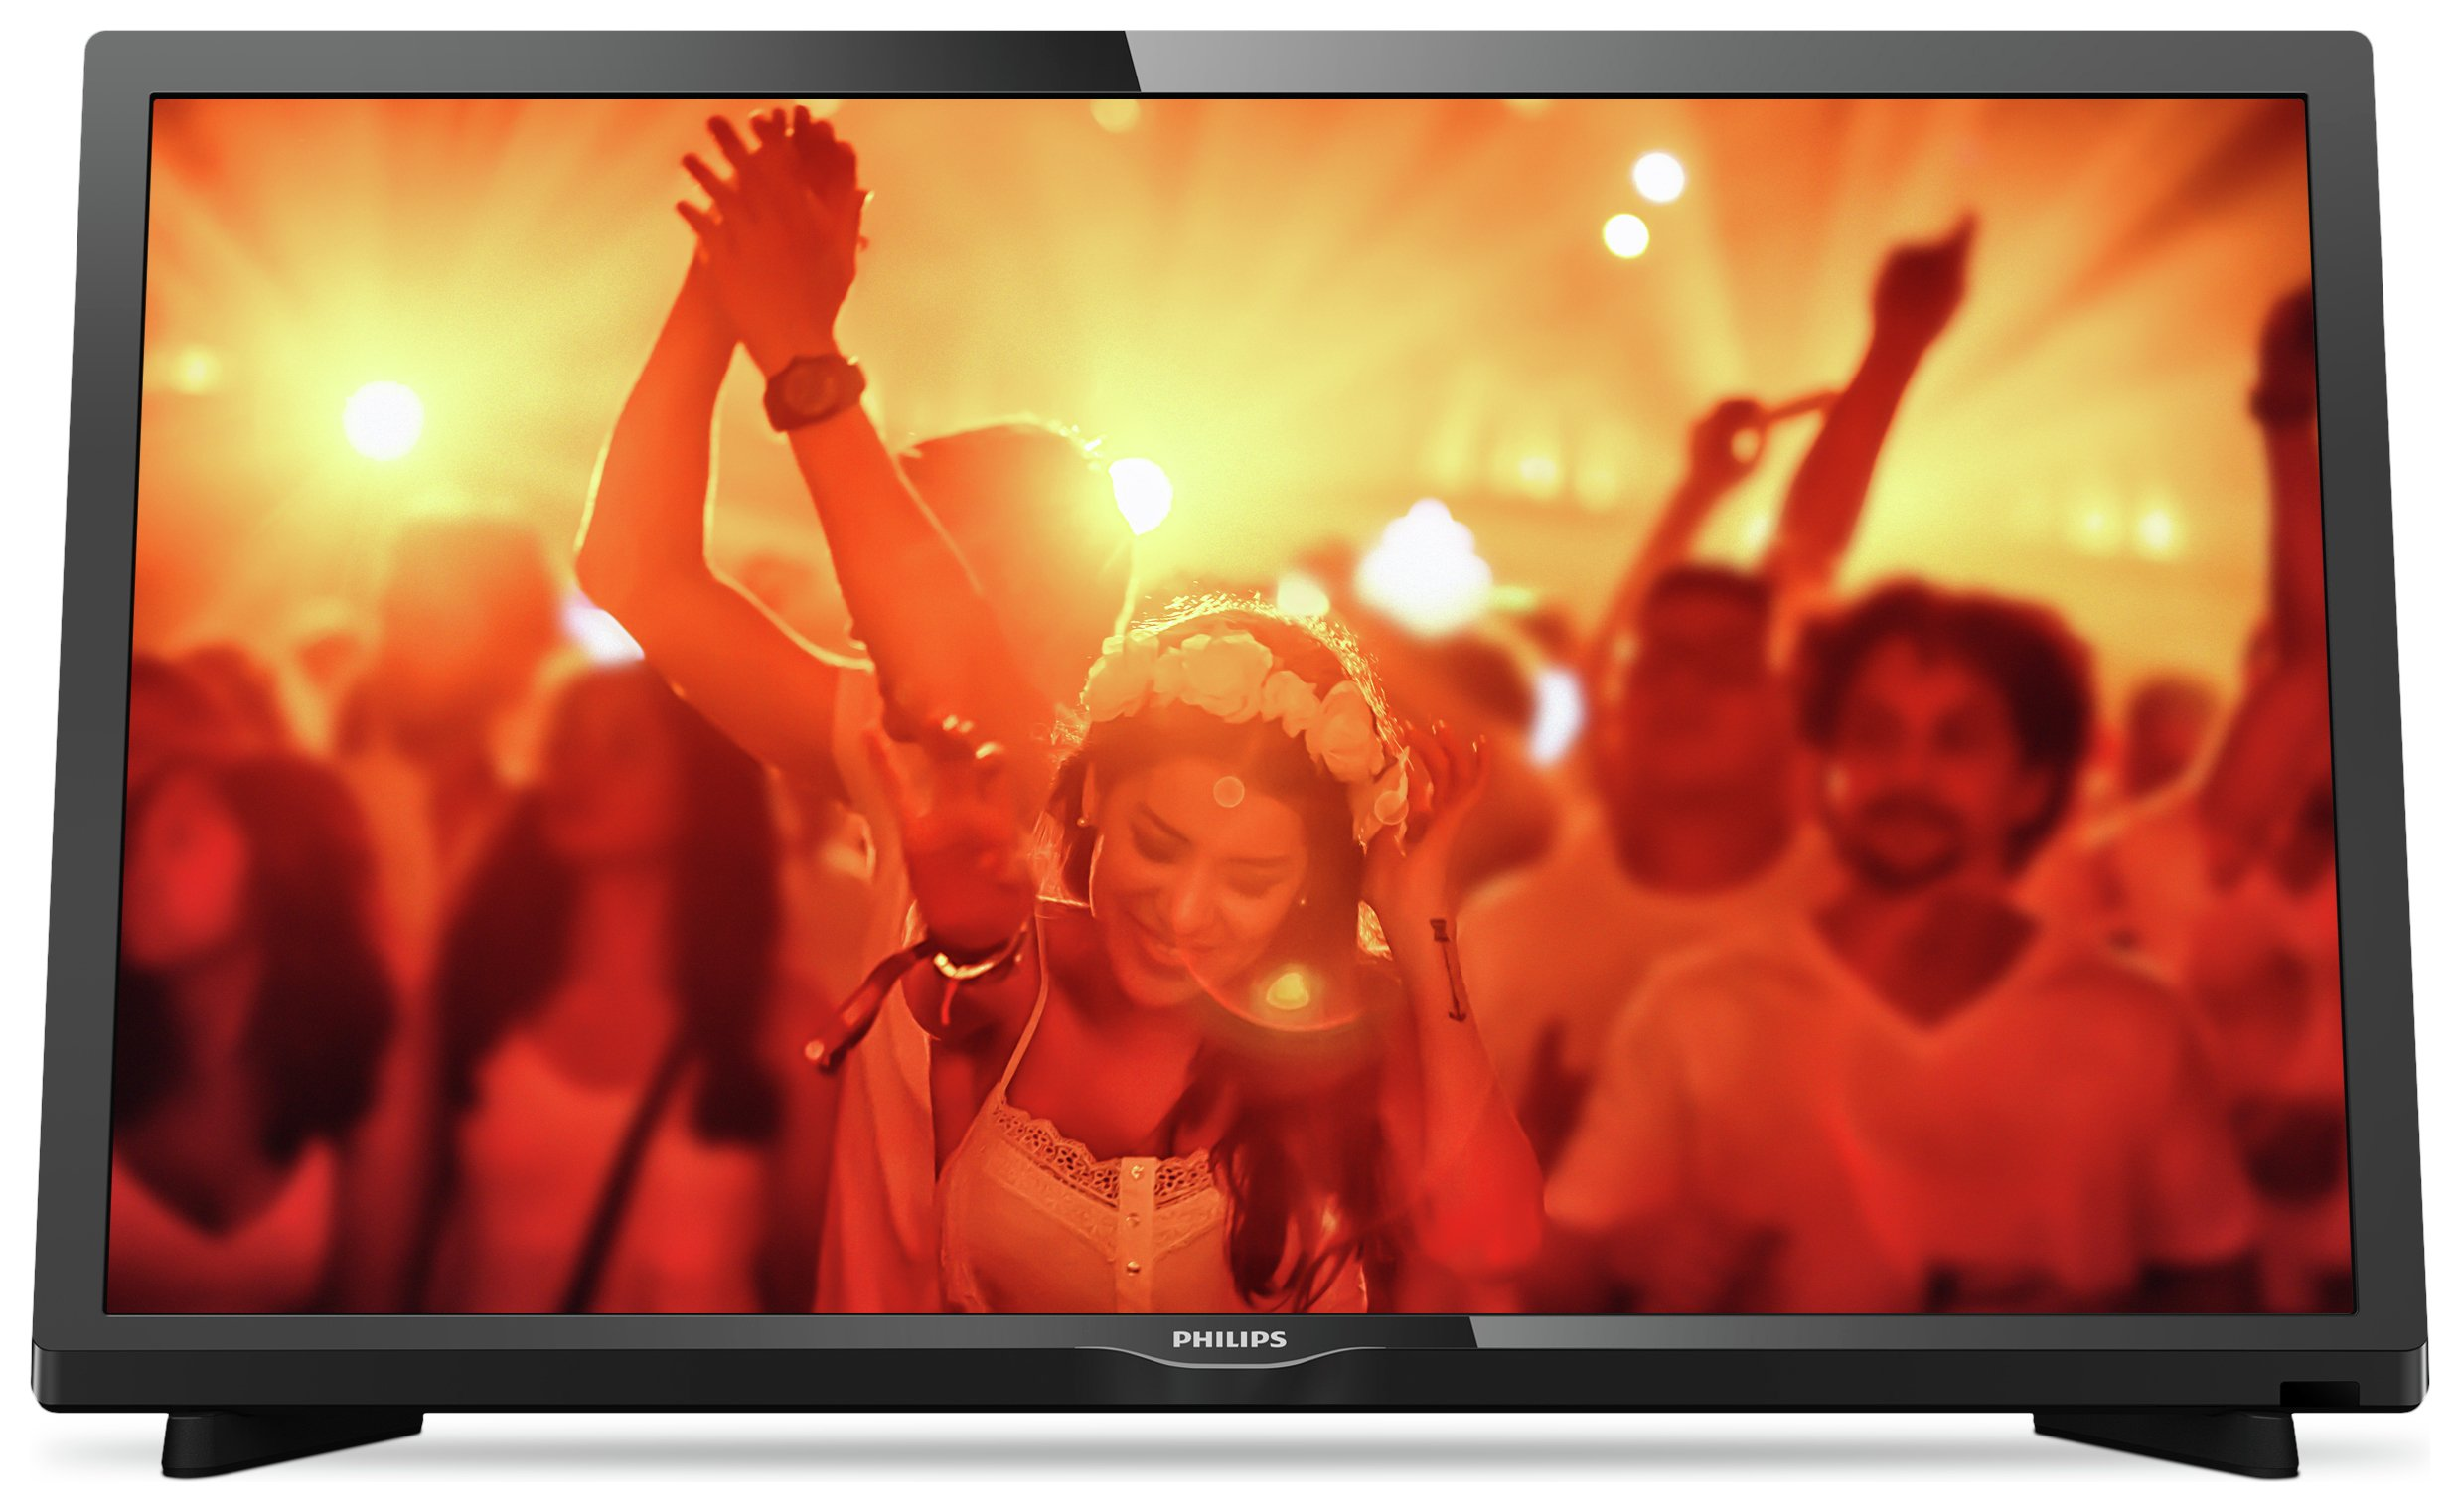 Philips - 24 Inch - 24PHT403105 - HD Ready FVHD TV. - Black